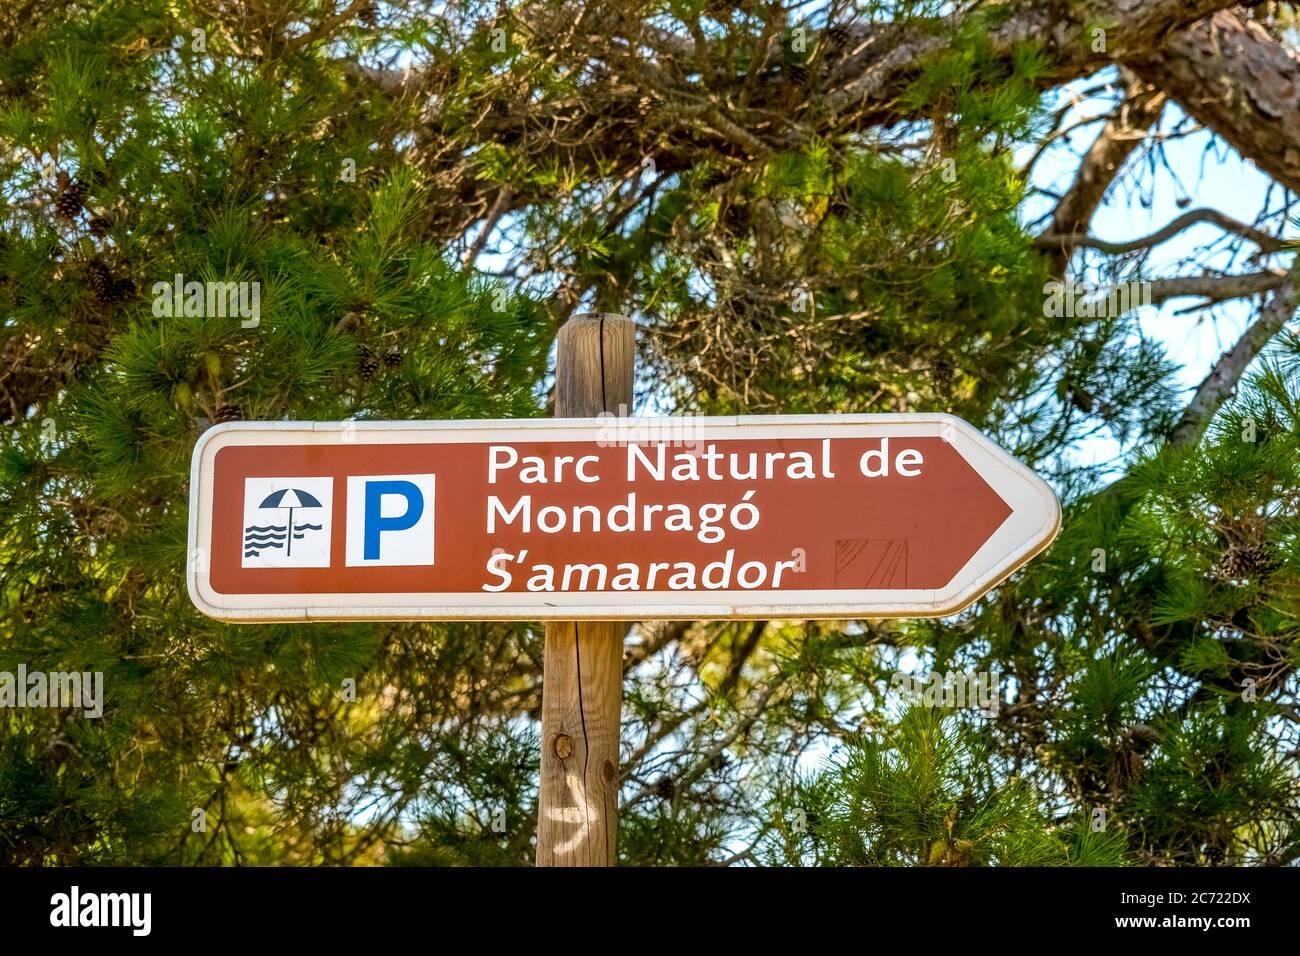 Parc Natural de Mondrago und Strand S'amador, Naturpark Mondrago in der Nähe von Santanyí, Europa, Balearen, Spanien, Santanyí, es, Reisen, Tourismus, esti Stockfoto